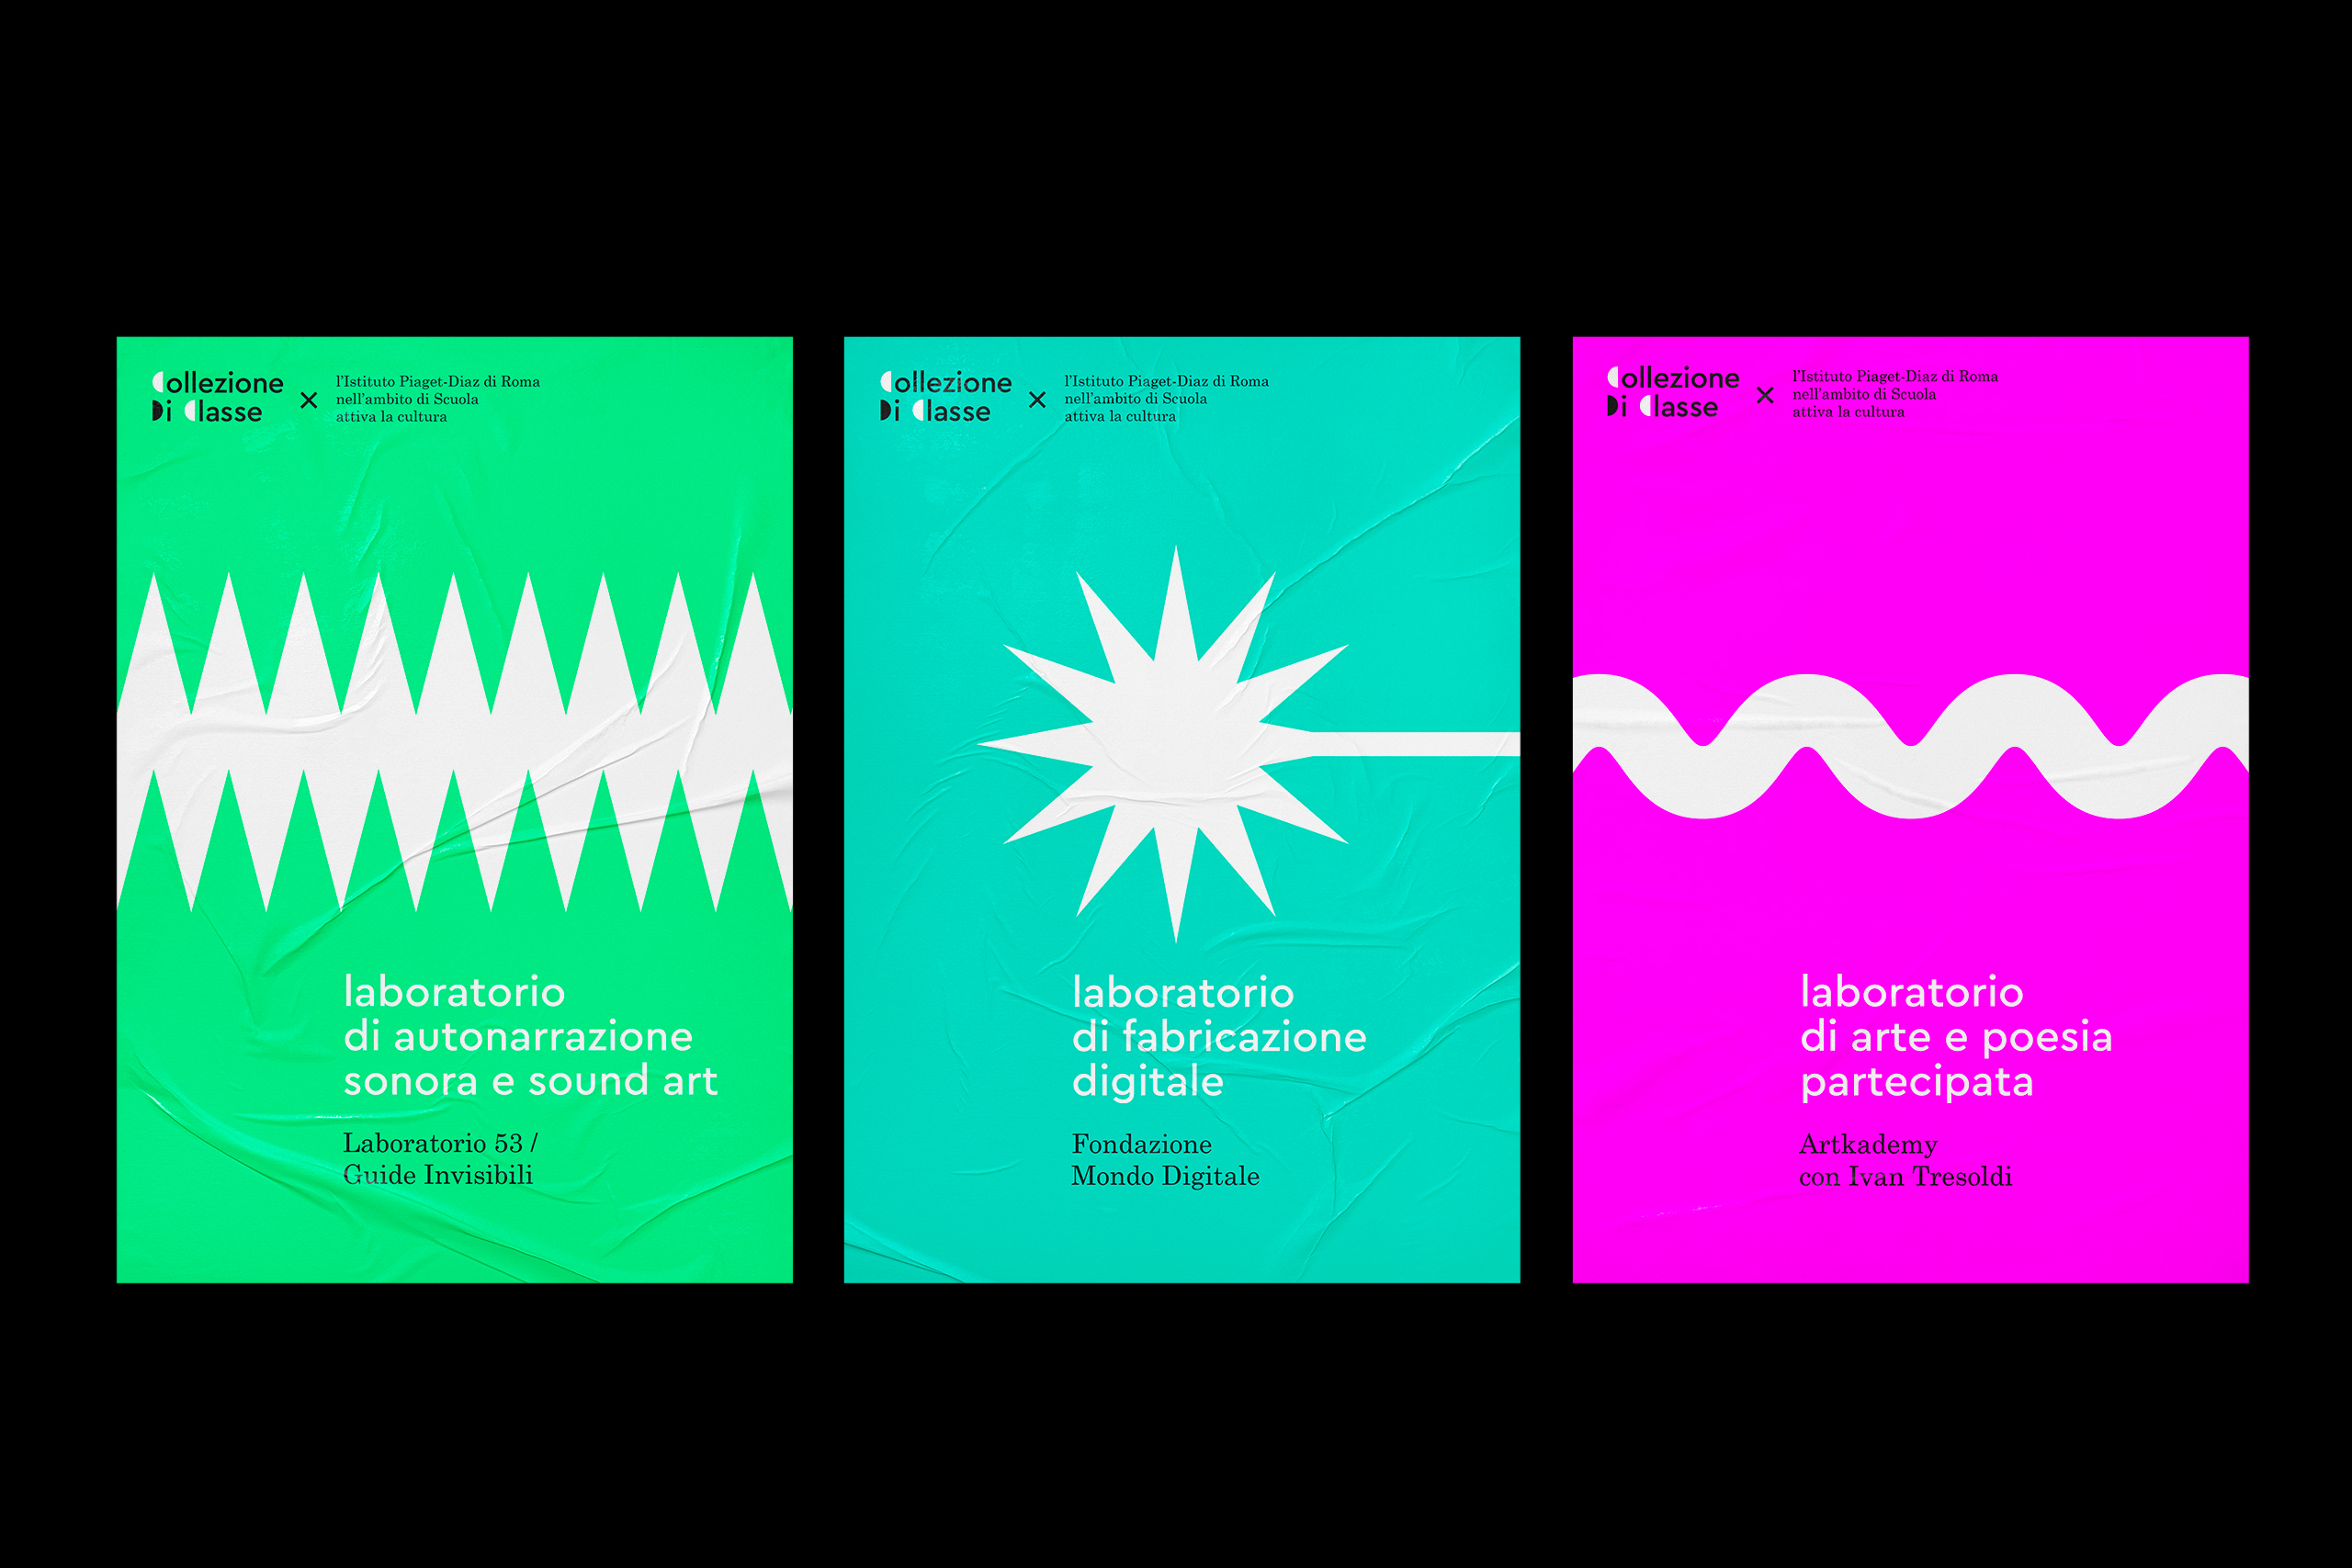 Giampiero_Quaini_collezionediclasse_poster_simboli